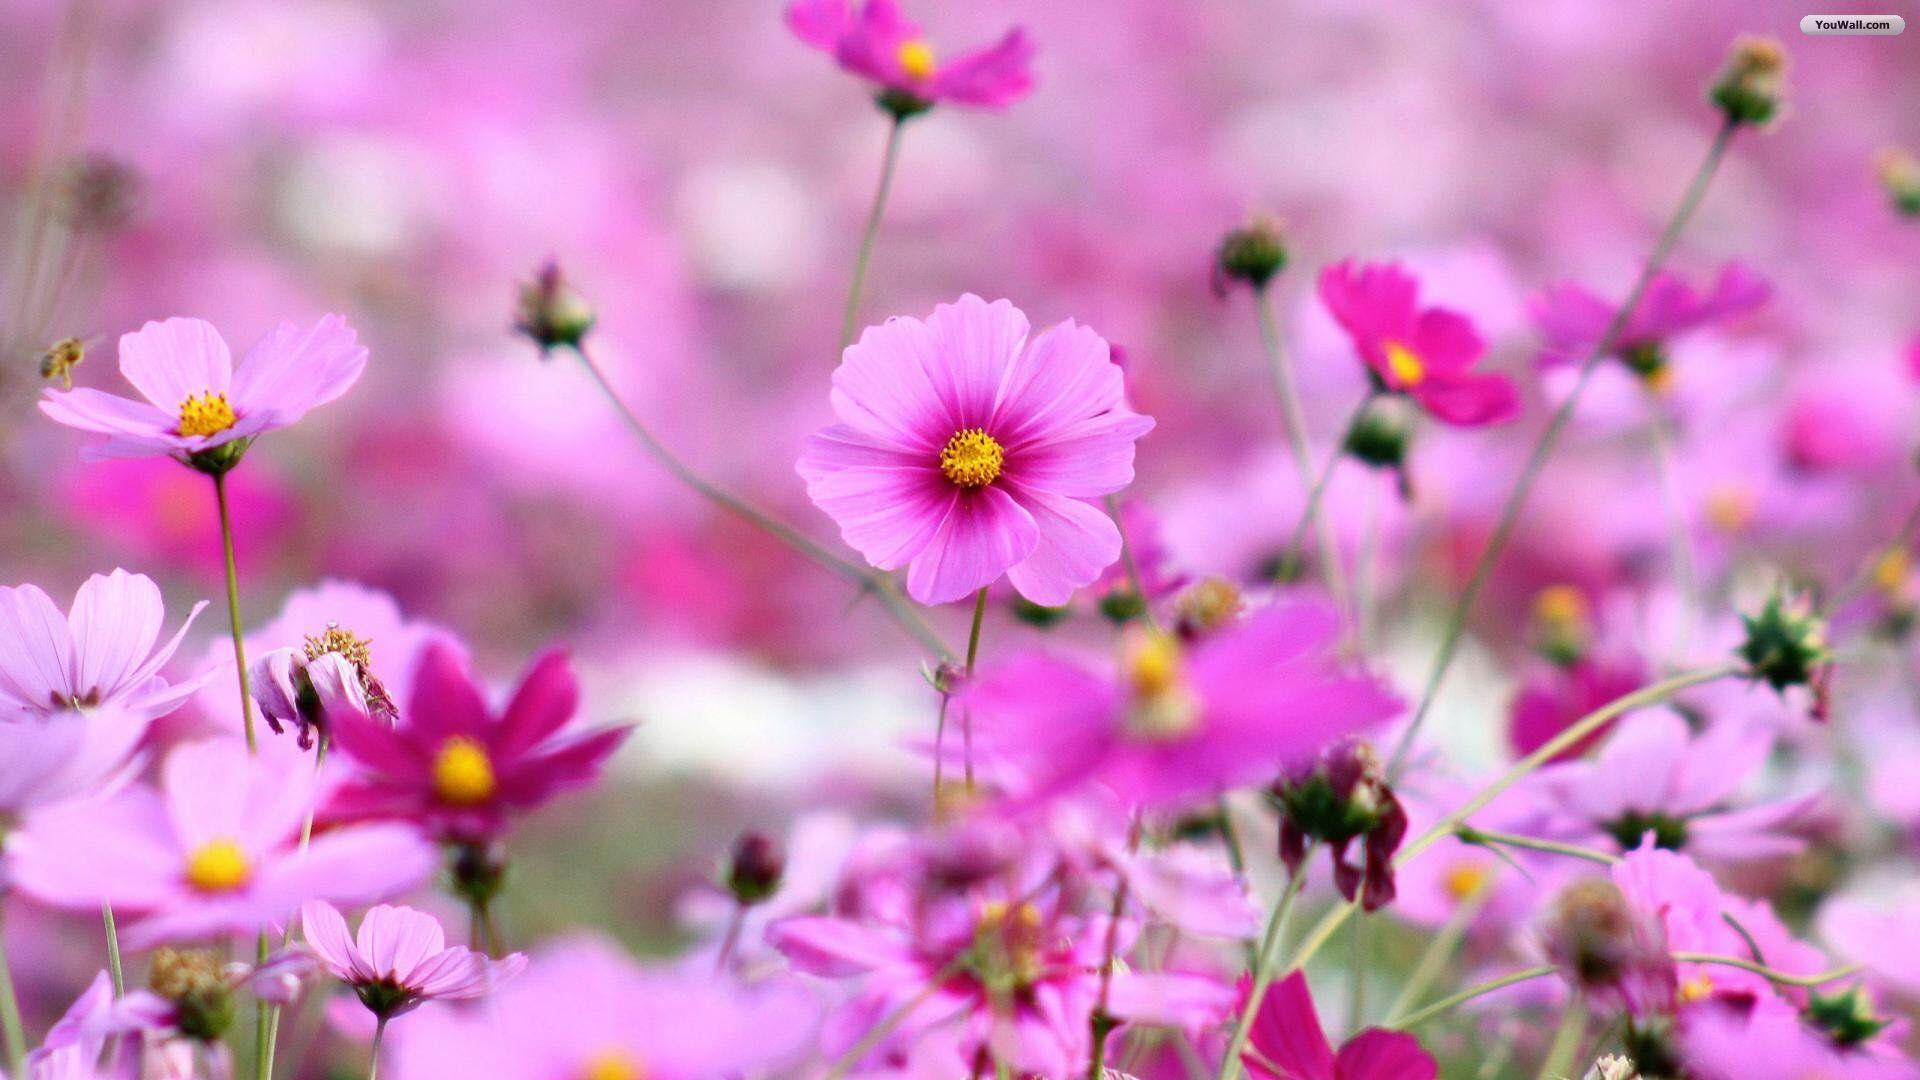 History Of Art Meno Istorija Istoriya Iskusstva Rosa Blumentapete Blumentapete Beste Blumen